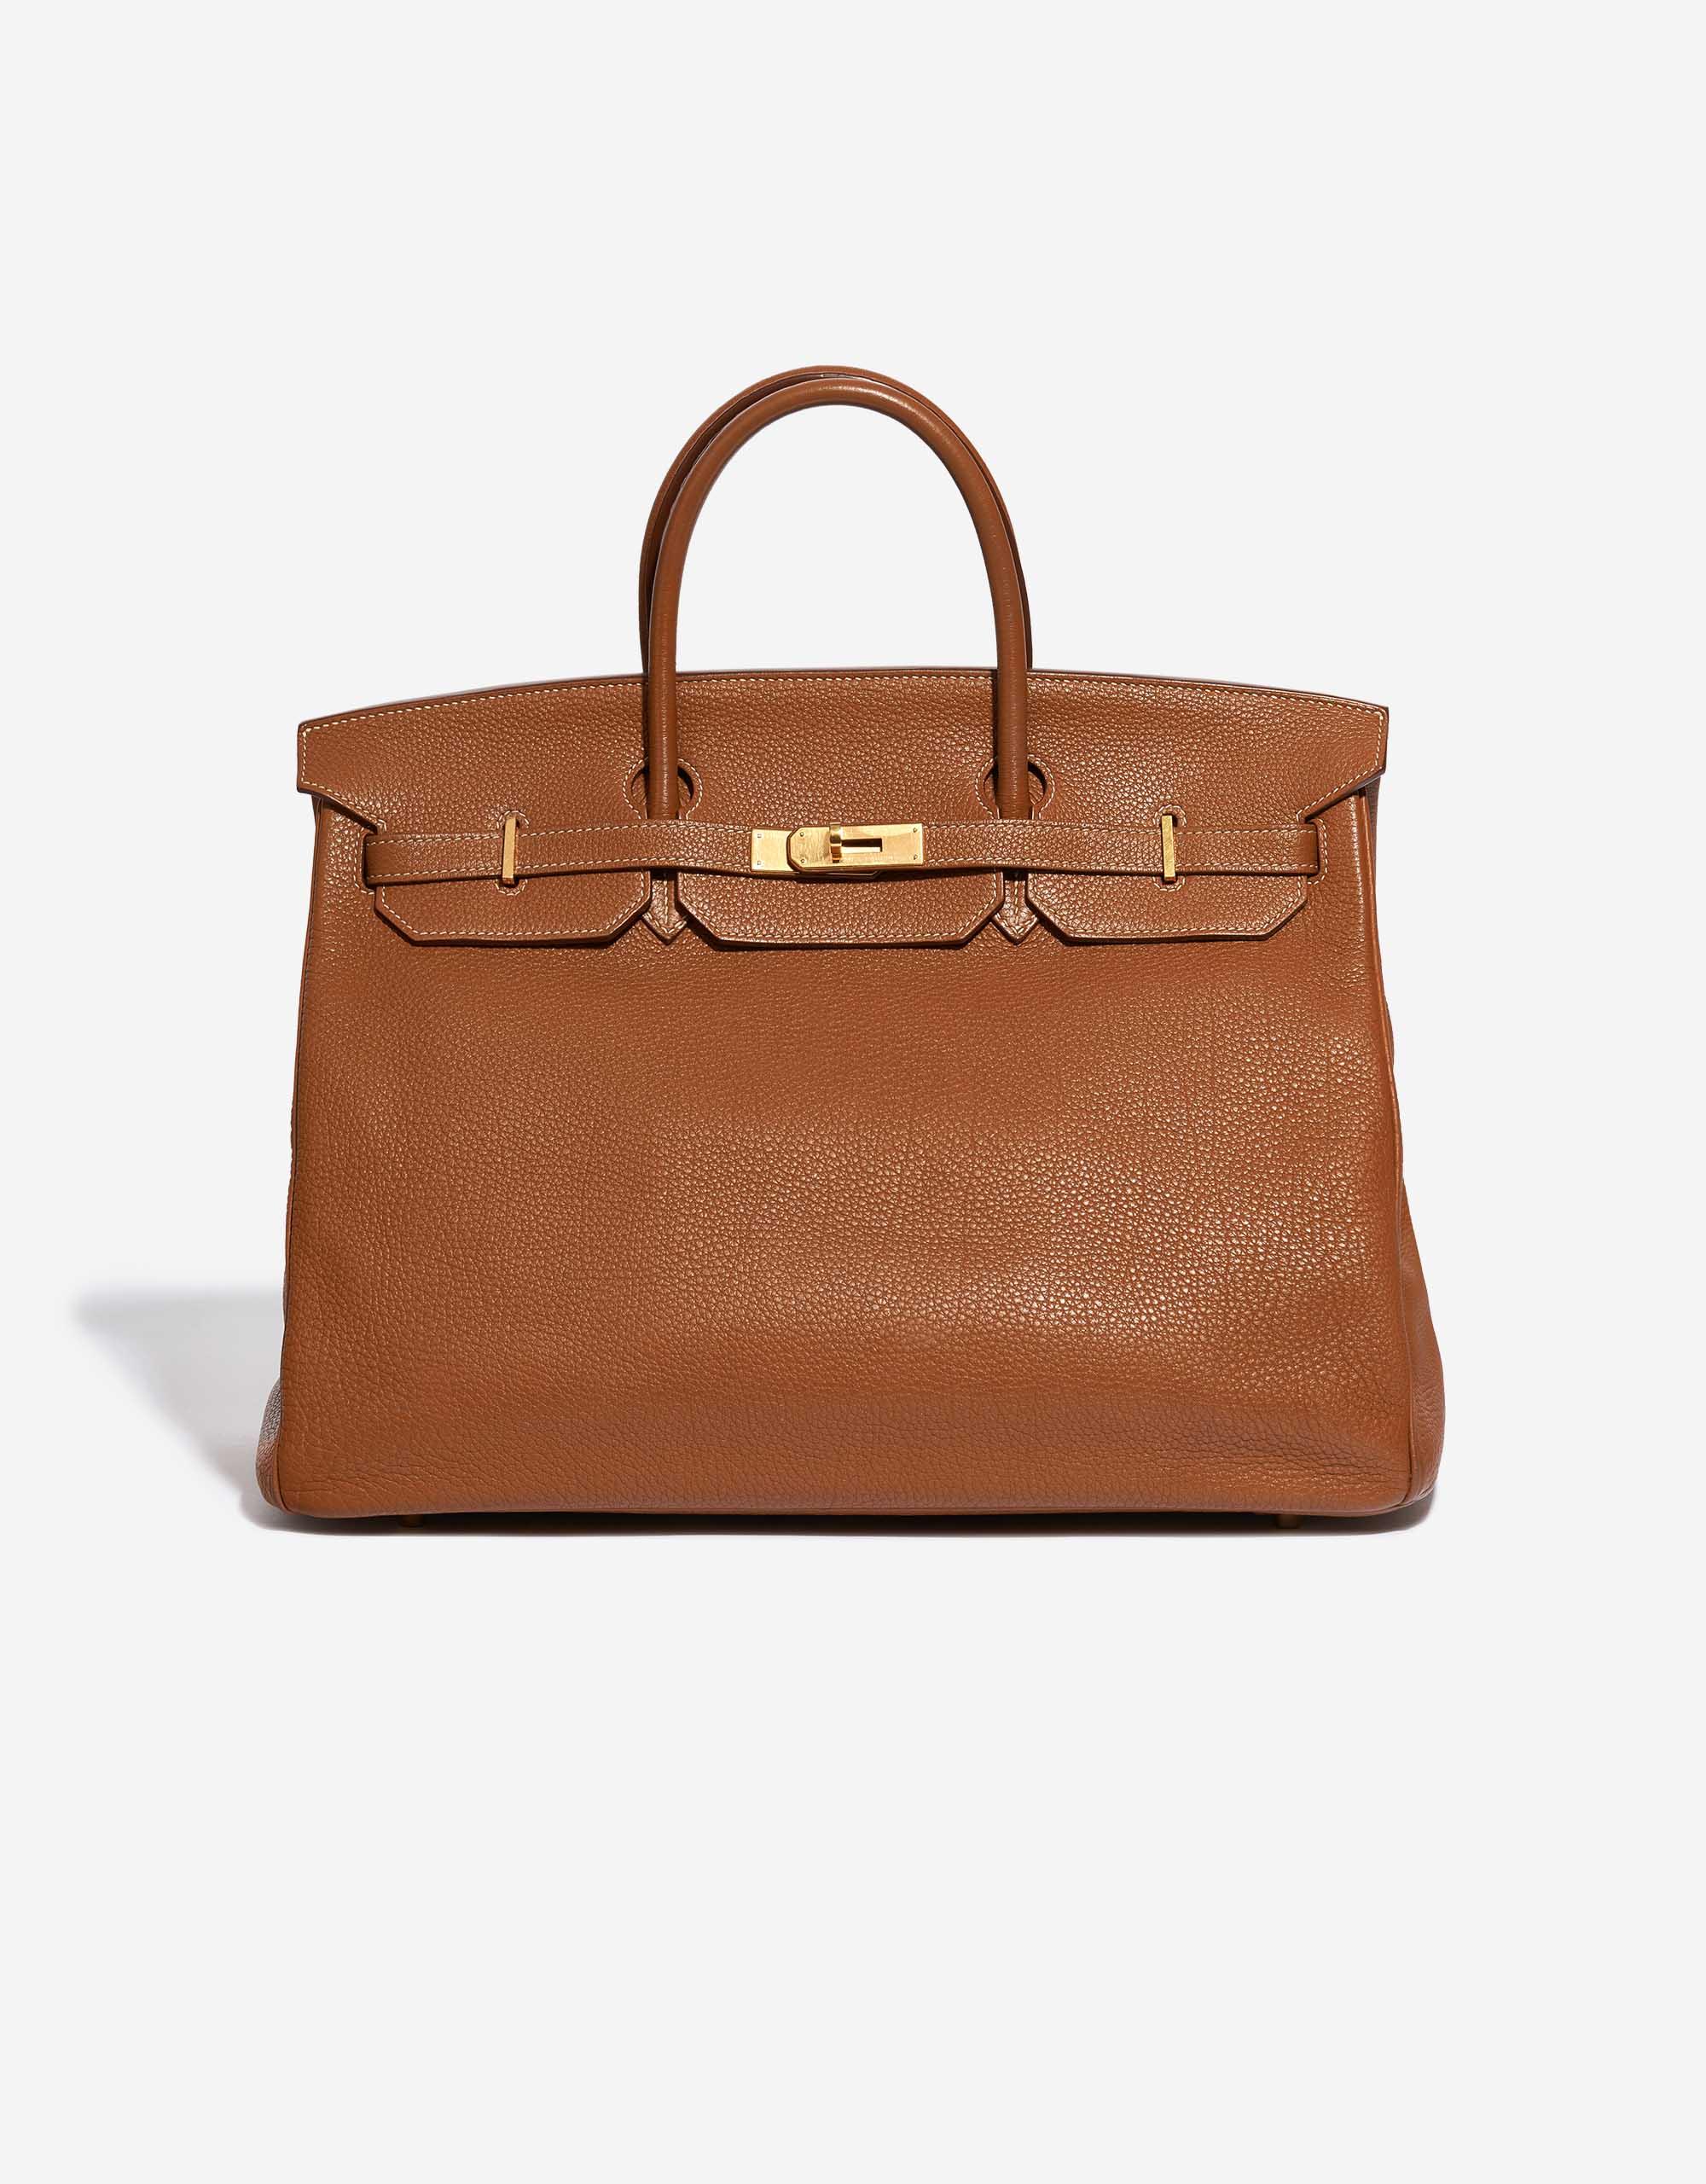 Hermès Birkin 40 Togo Gold | SACLÀB